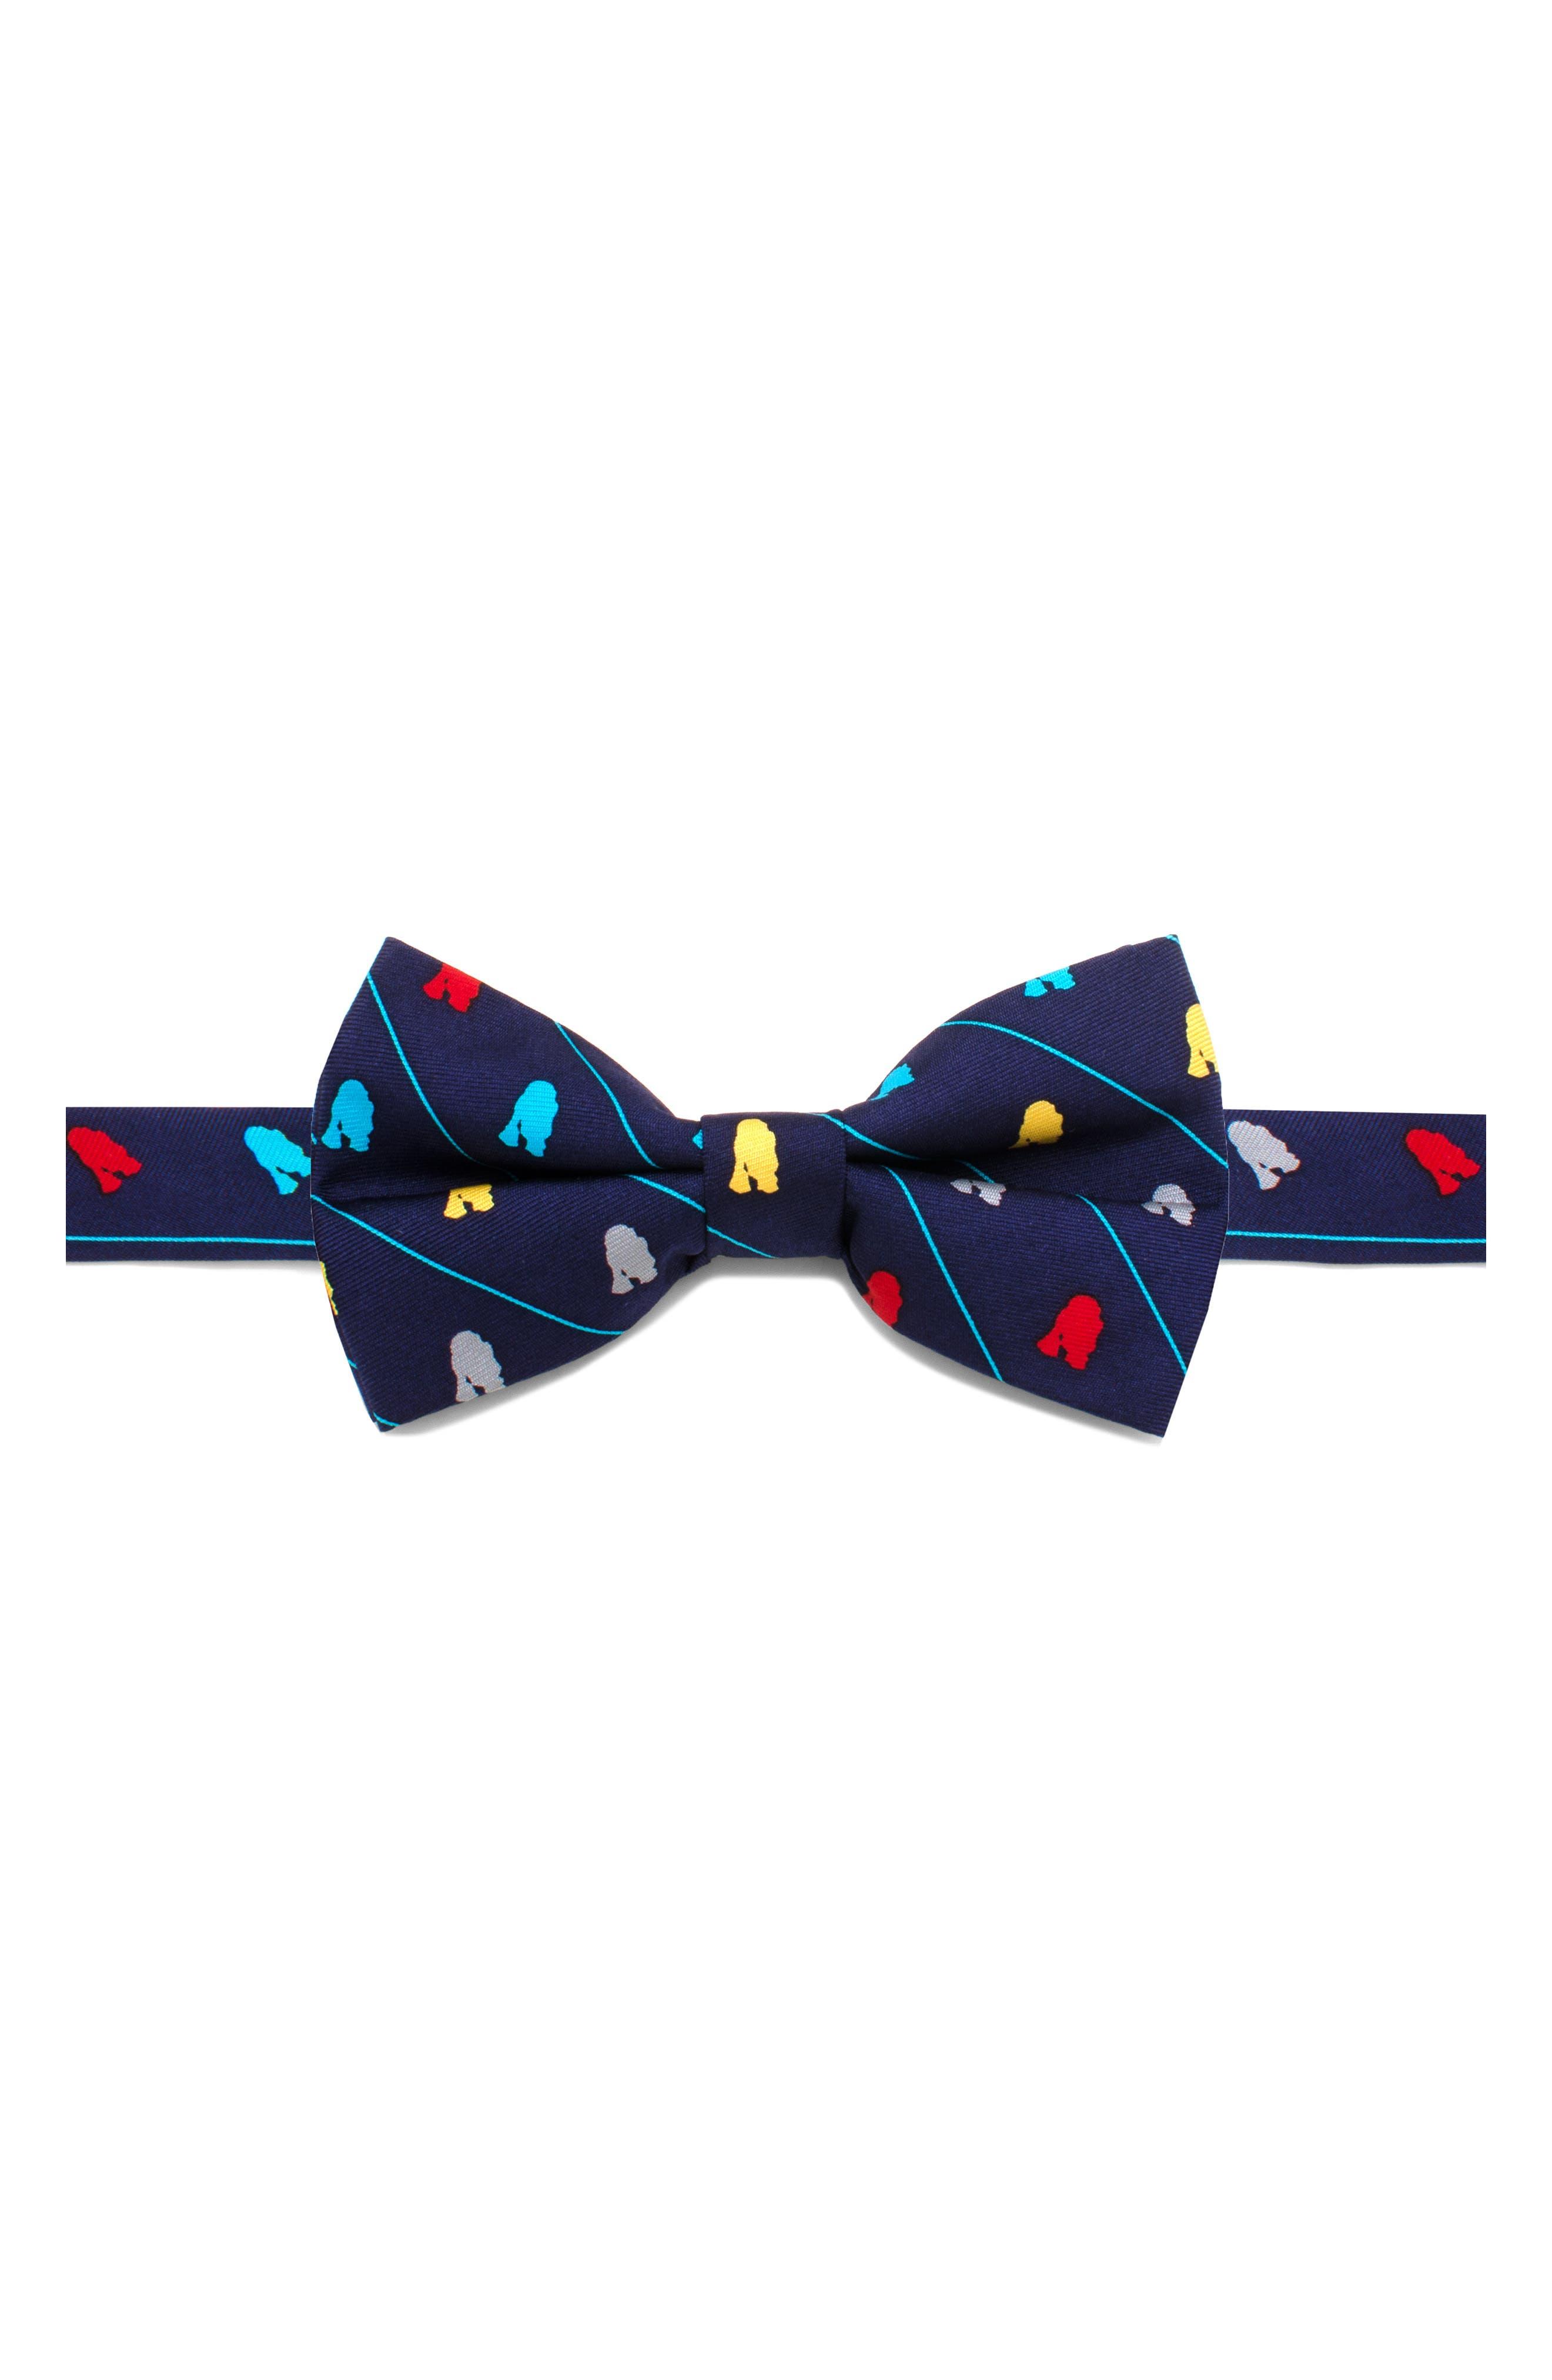 'Star Wars<sup>™</sup>- R2-D2 Stripe' Silk Bow Tie,                             Alternate thumbnail 2, color,                             460